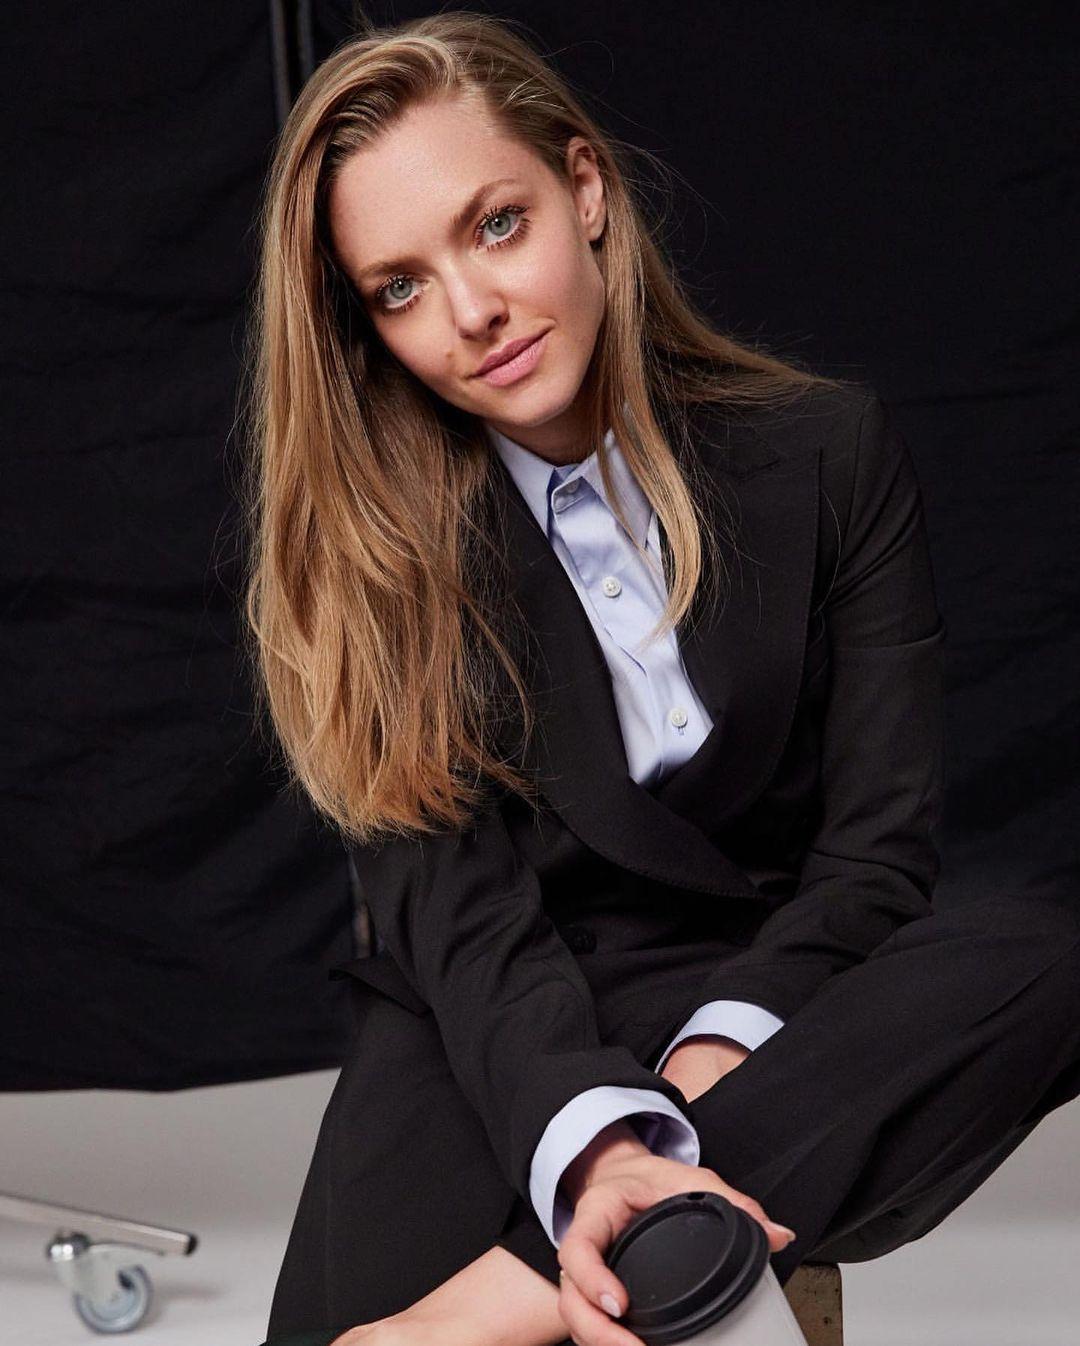 Amanda-Seyfried-Wallpapers-Insta-Fit-Bio-5